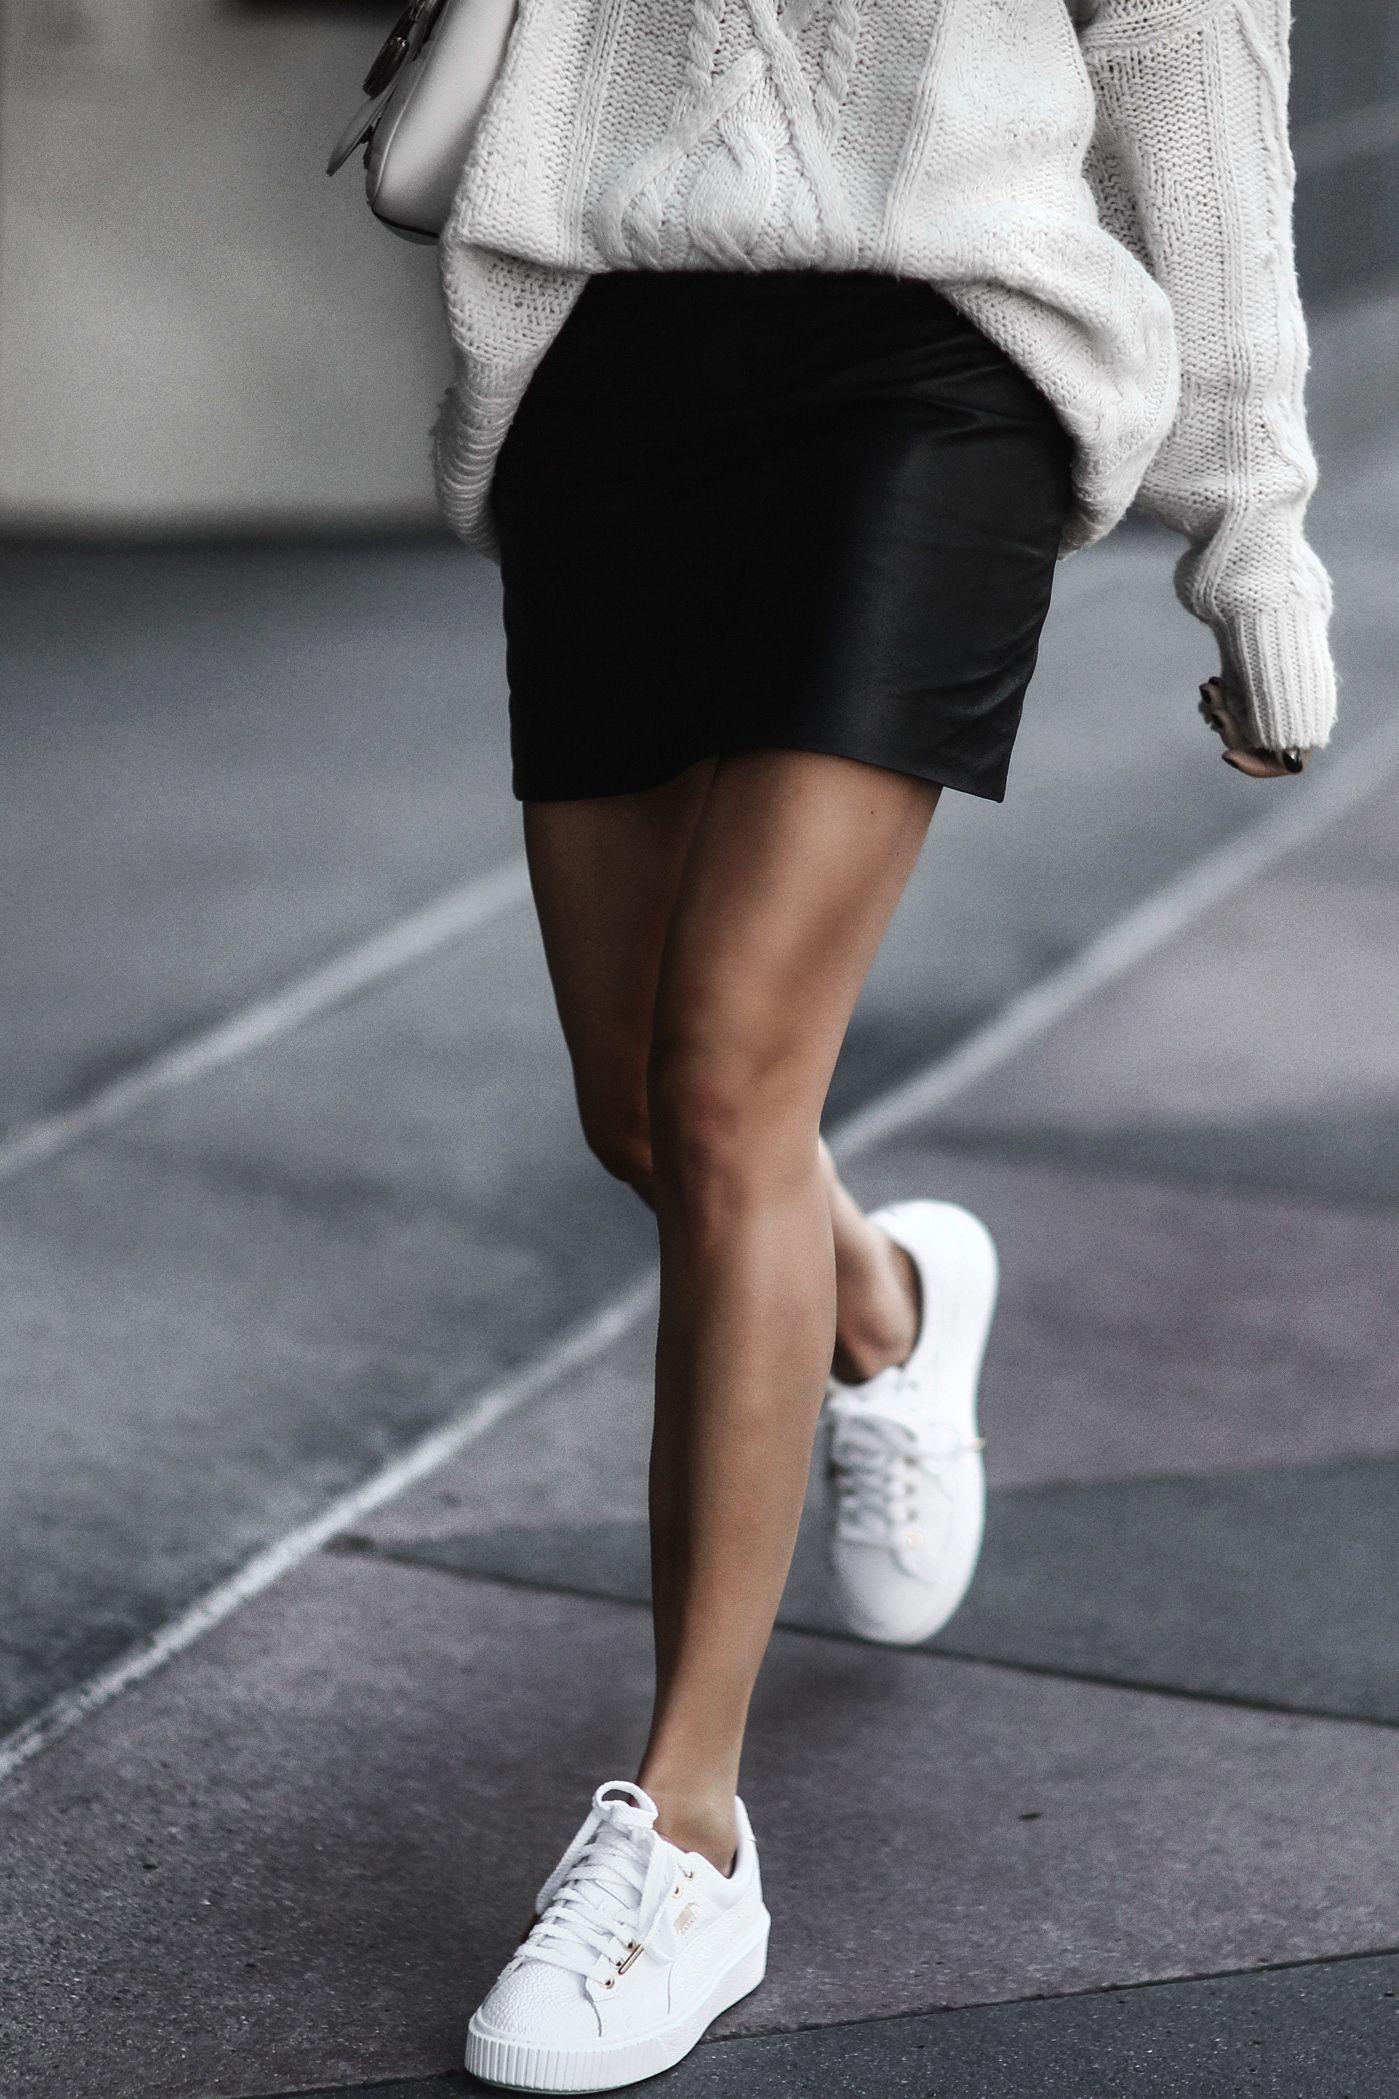 Beauty , Fashion & Lifestyle: PUMA CALI Sneaker ♡